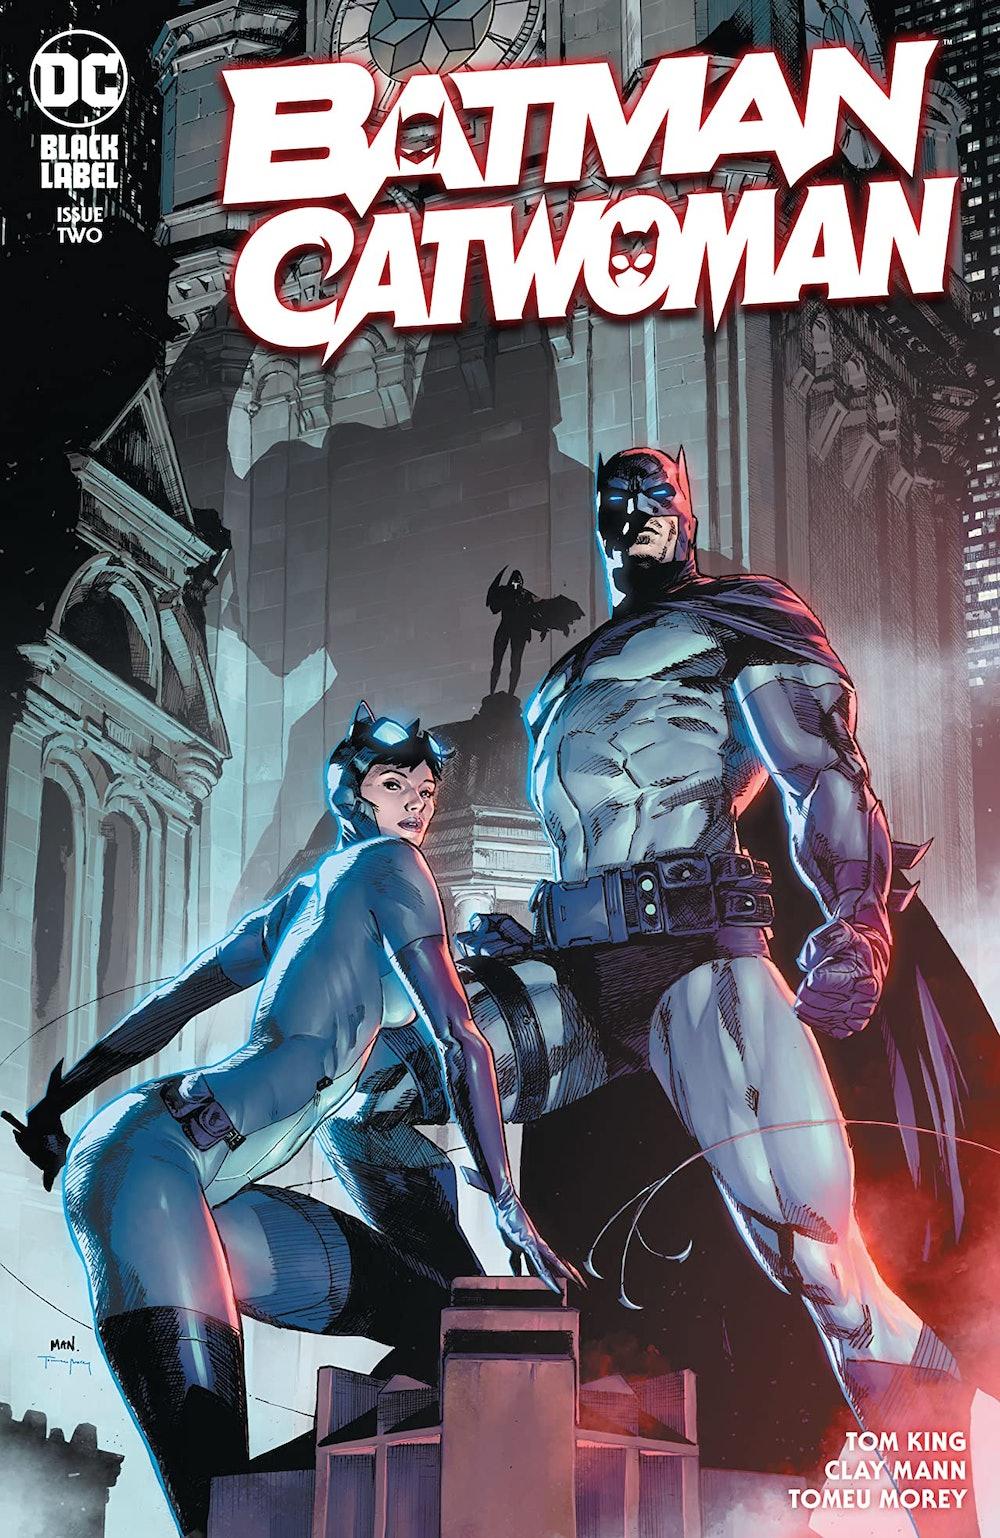 Batman Catwoman Issue 2